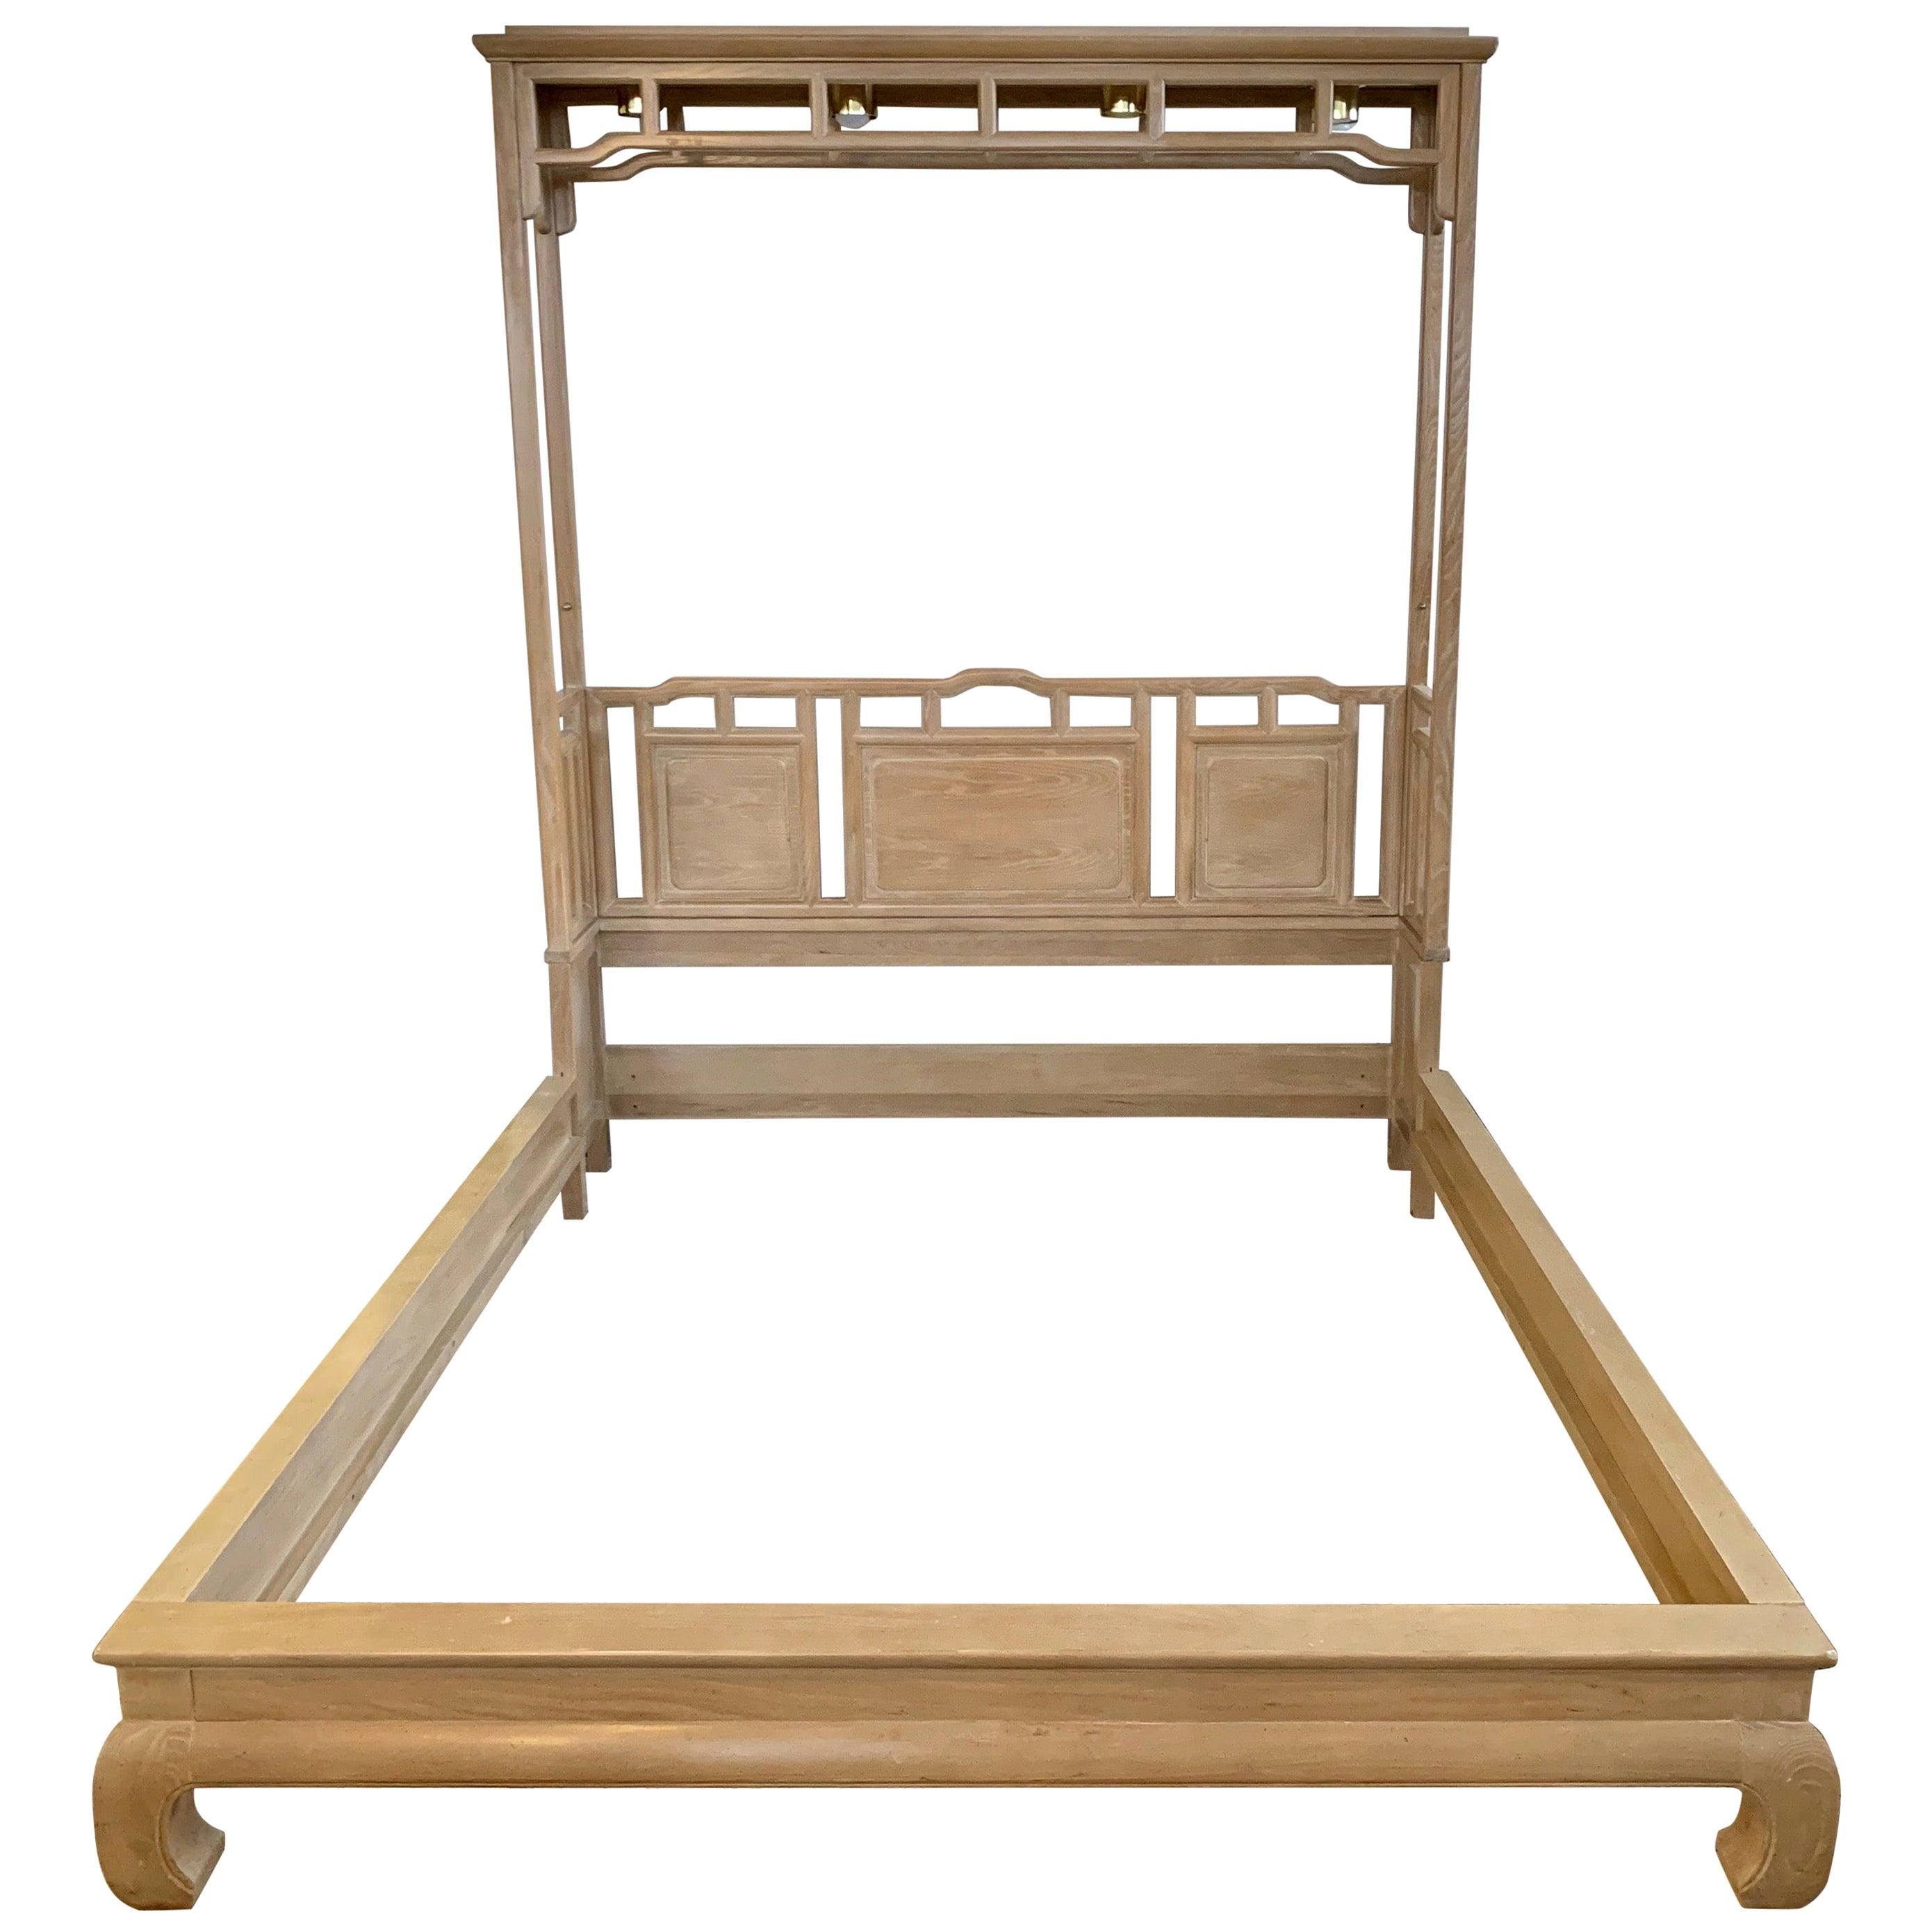 Century Furniture Company Ray Sabota Designed Illuminated Alcove Queen Size Bed